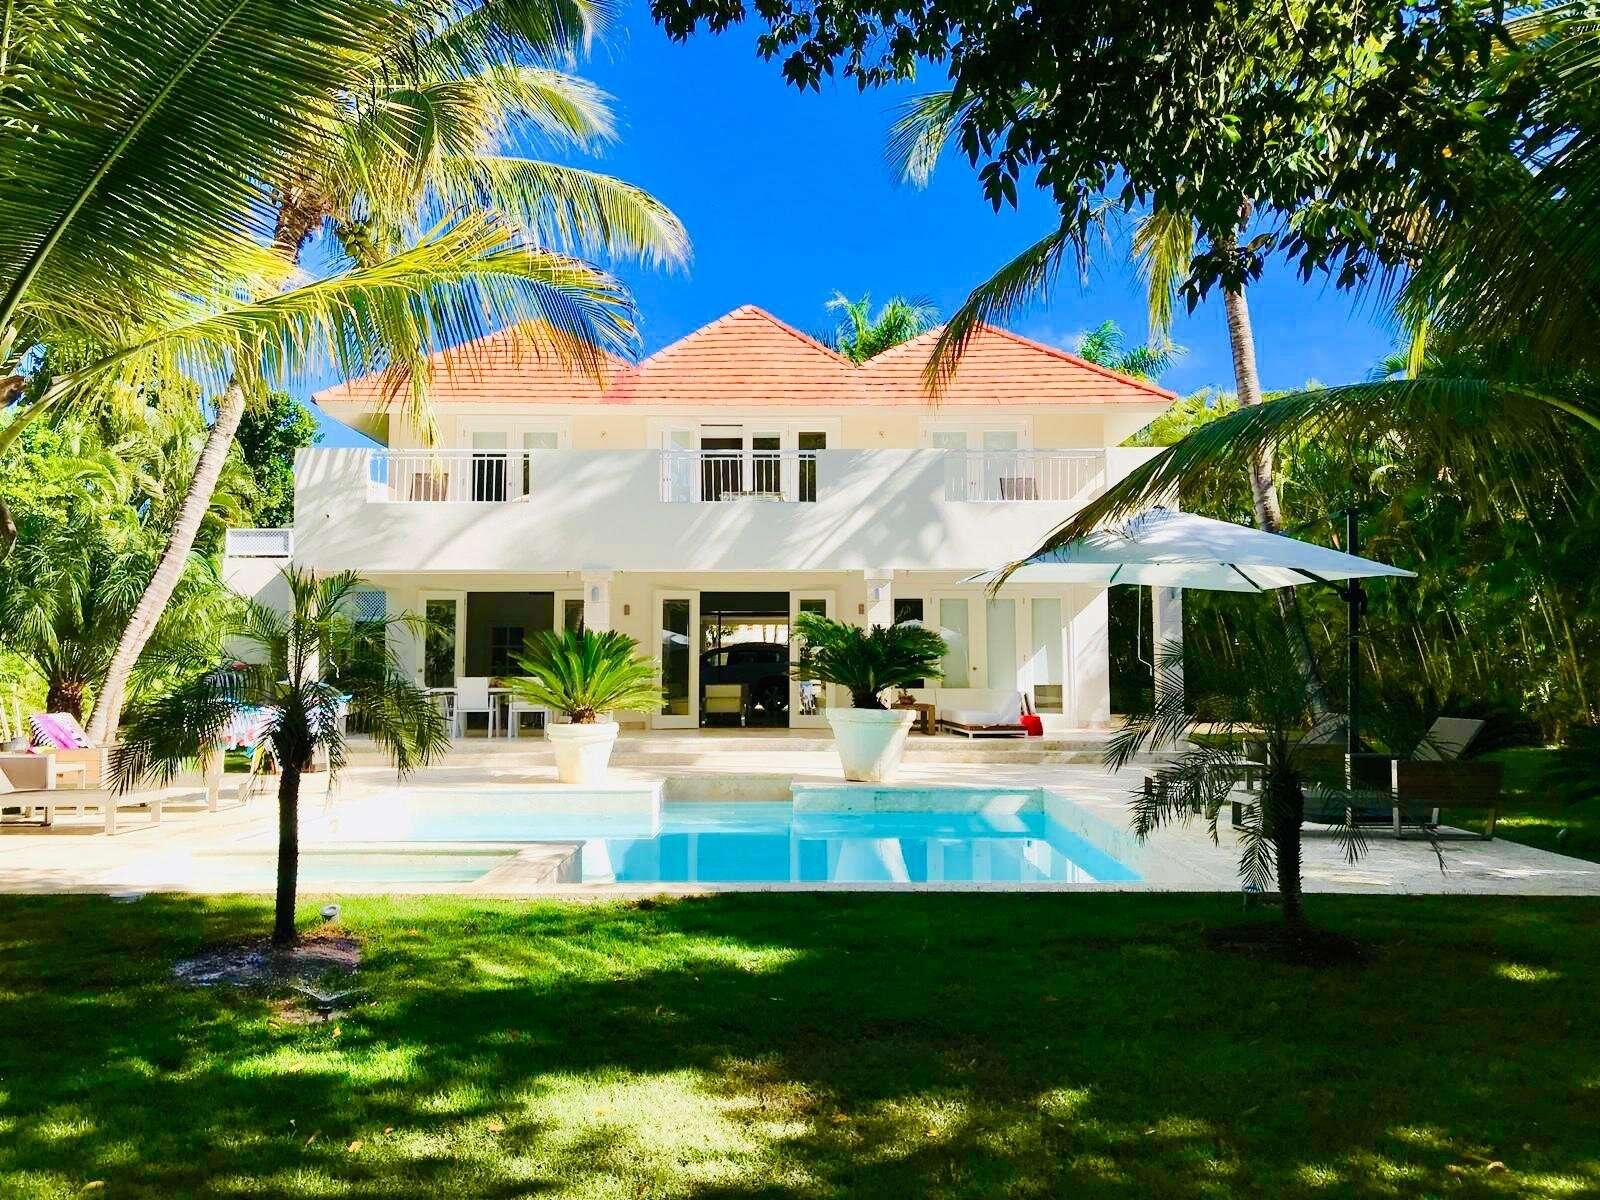 - Villa Liliana - Image 1/17